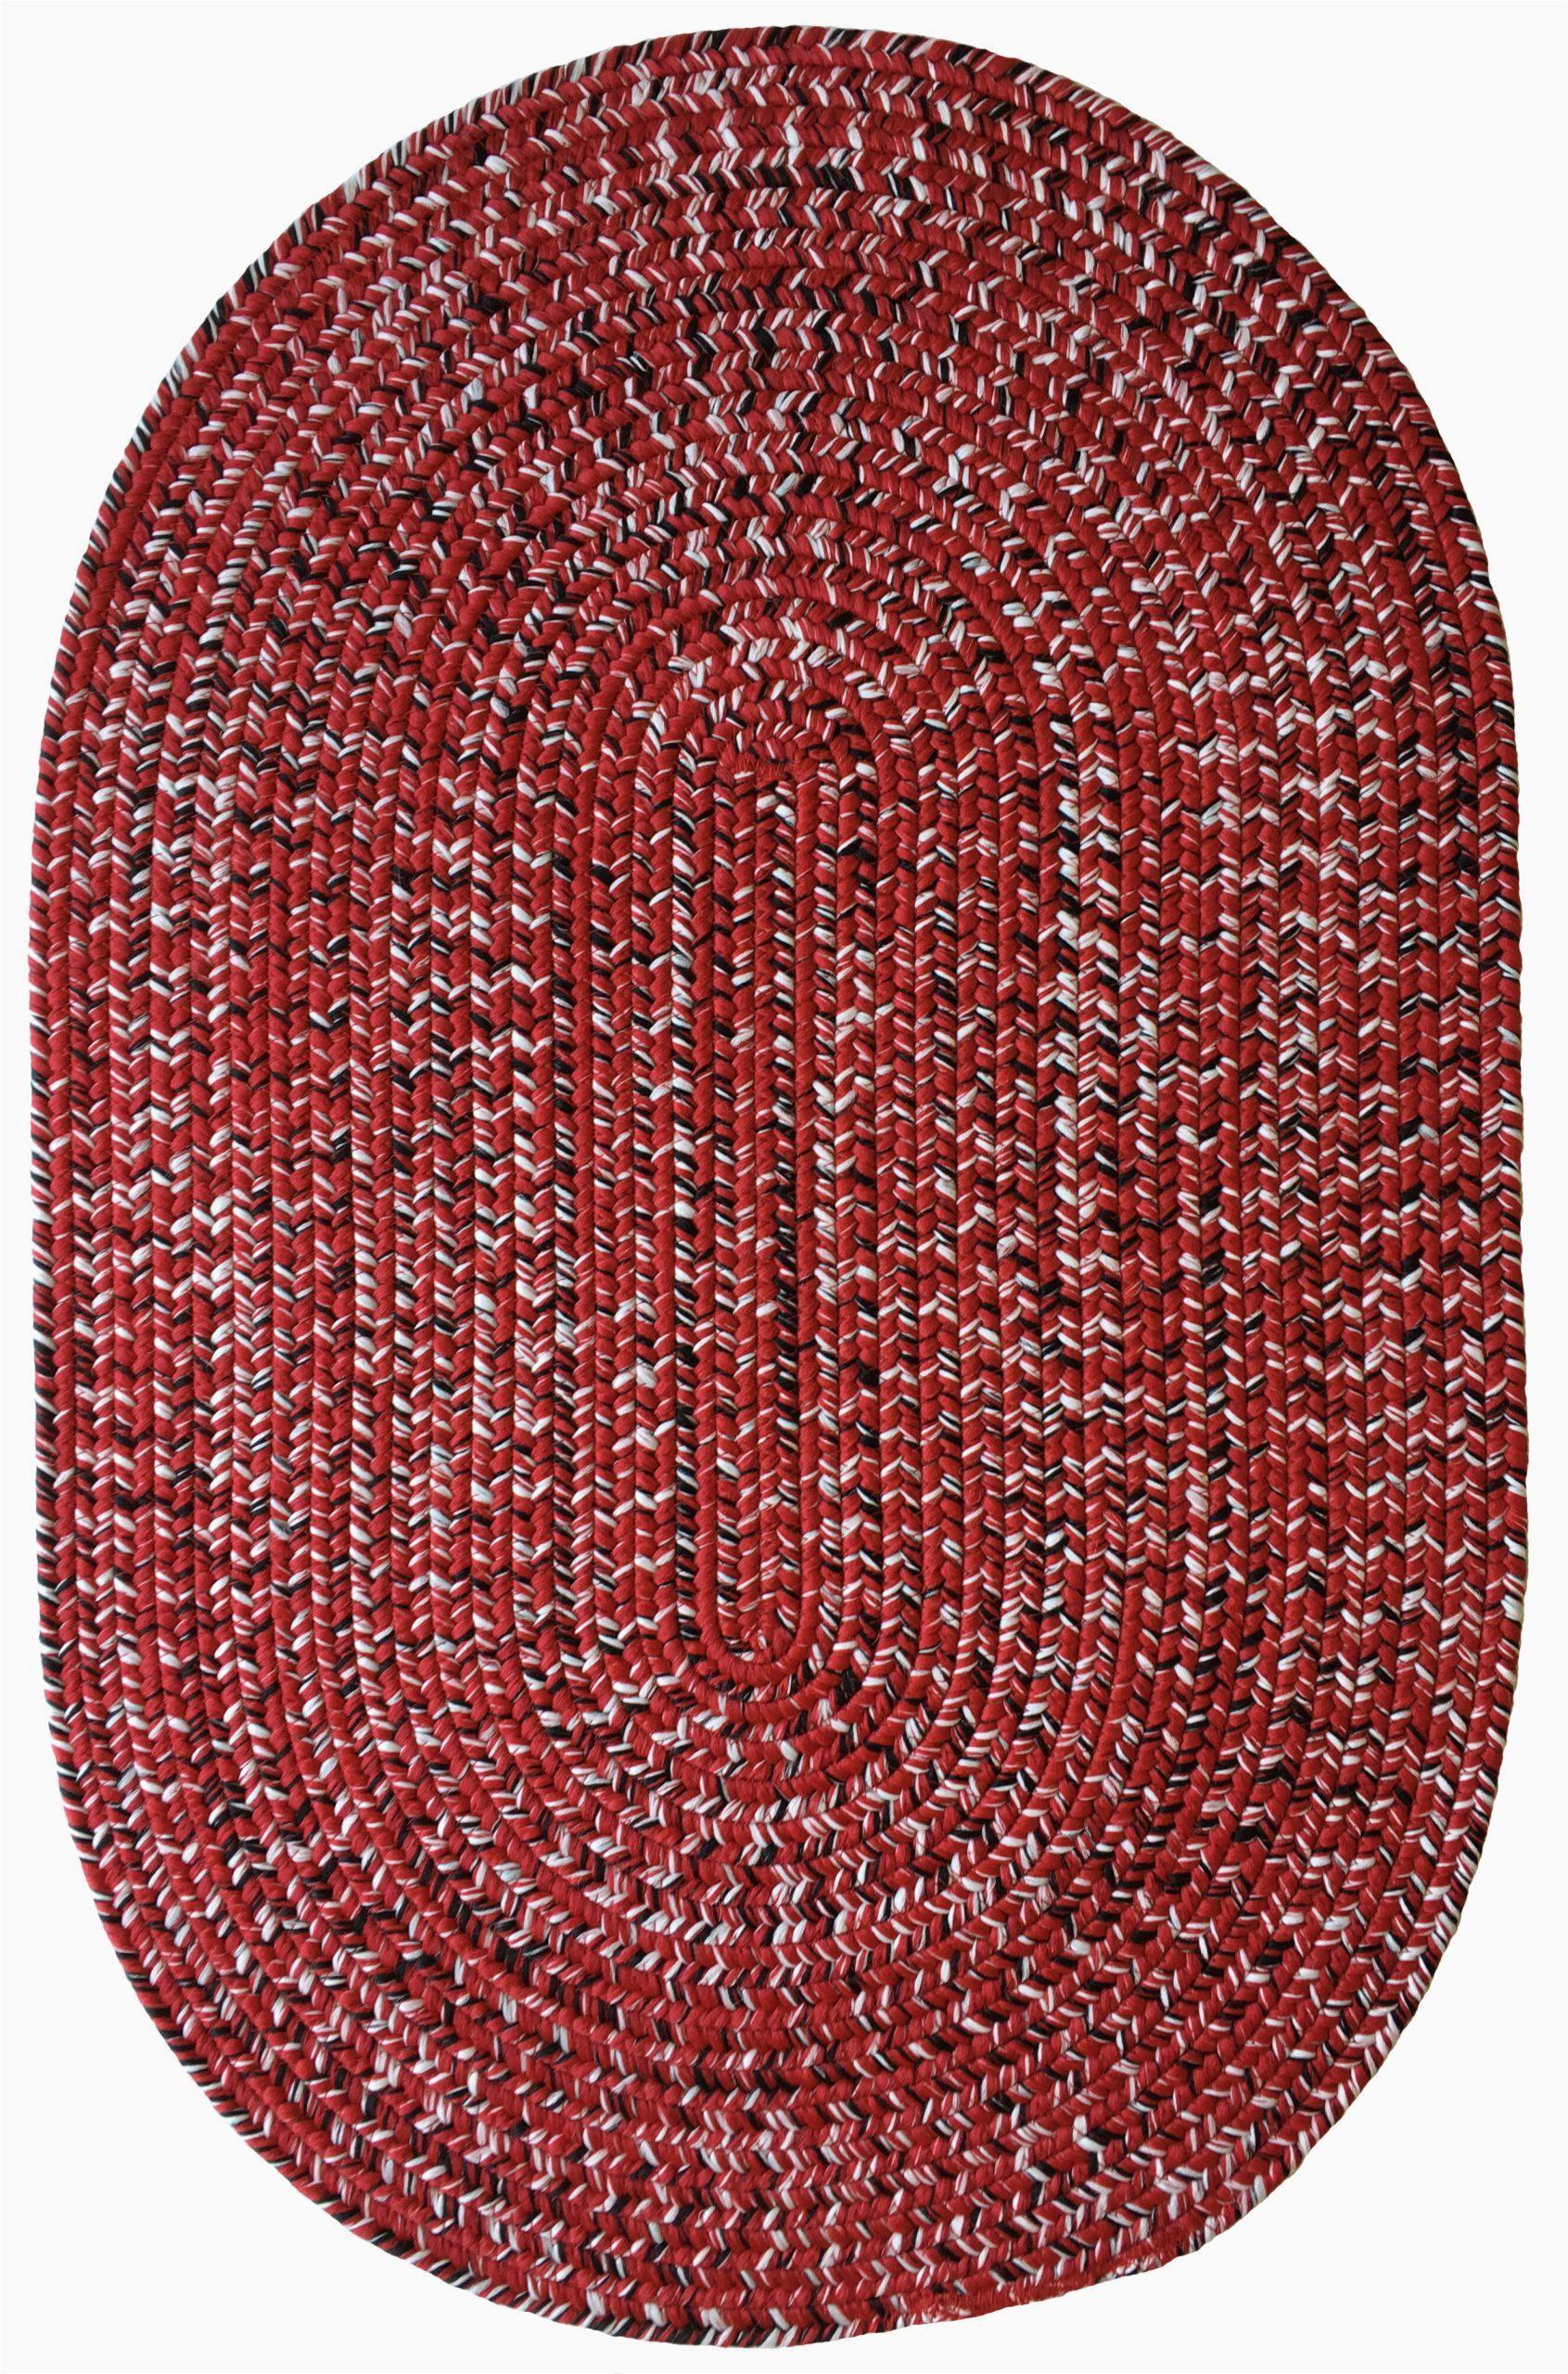 aarush hand braided redwhite area rug